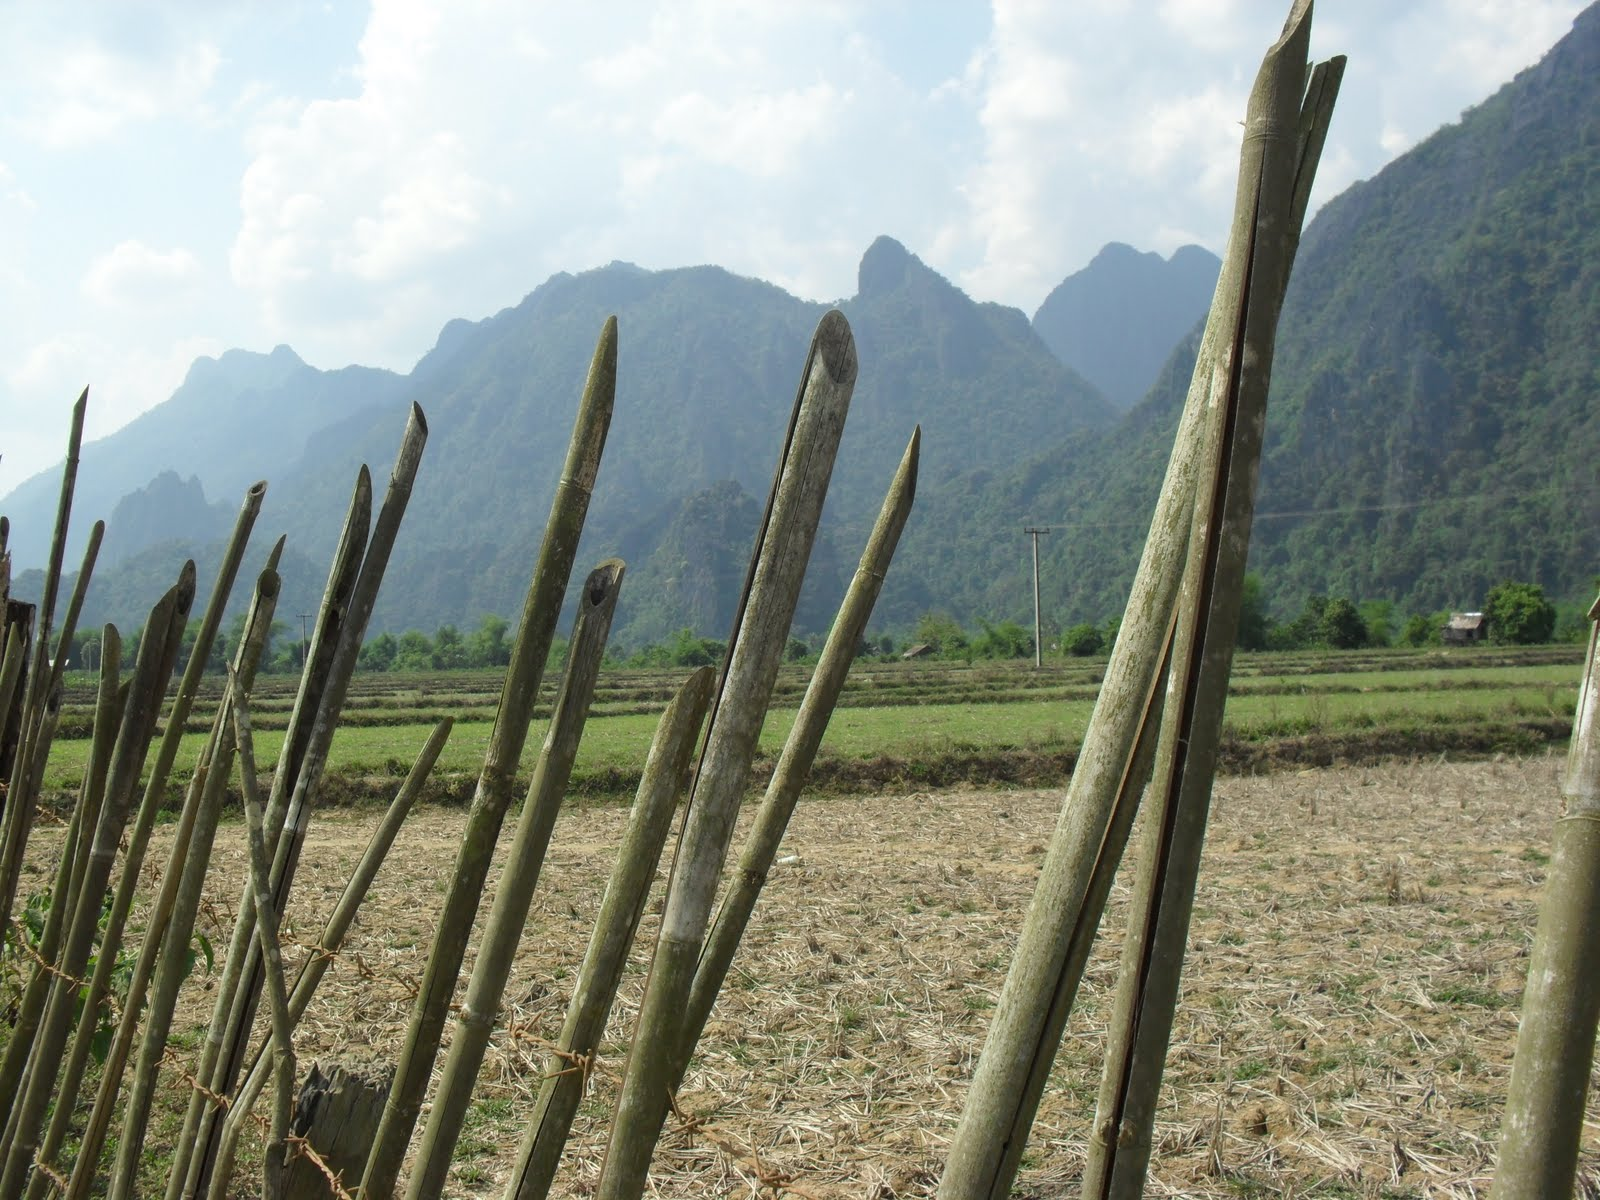 Chợ Viềng: PhD Rehab: Scooter Riding In Vang Vieng, Laos